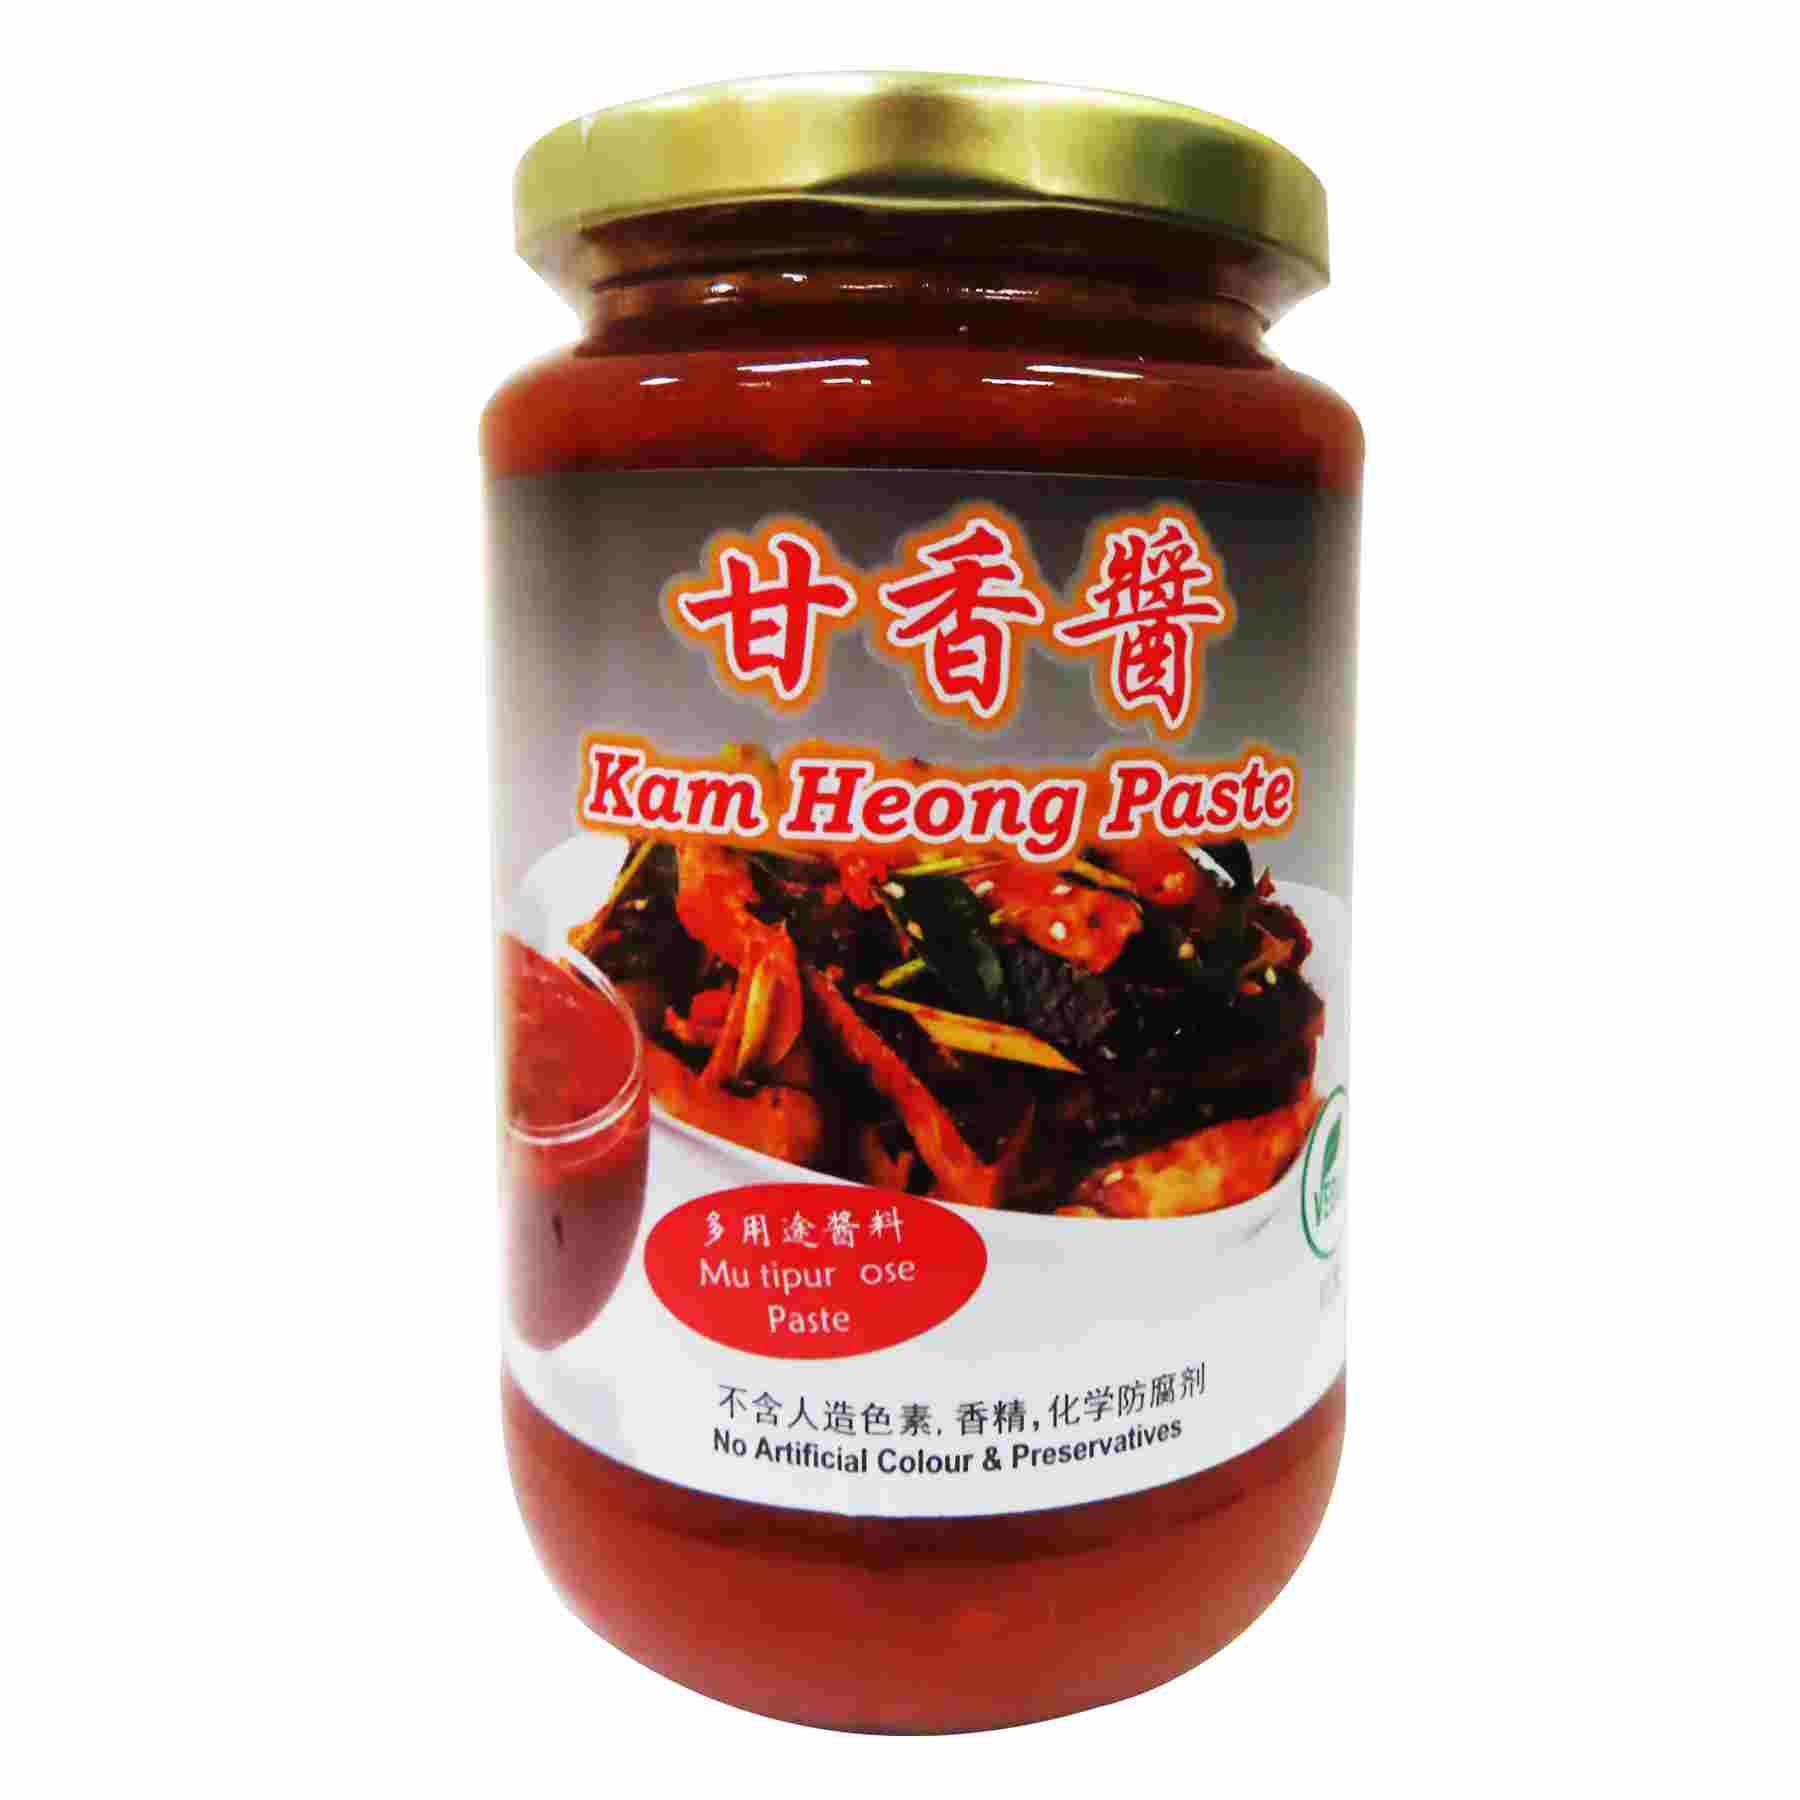 Image Kam Heong Paste 陈记 - 甘香酱 380grams